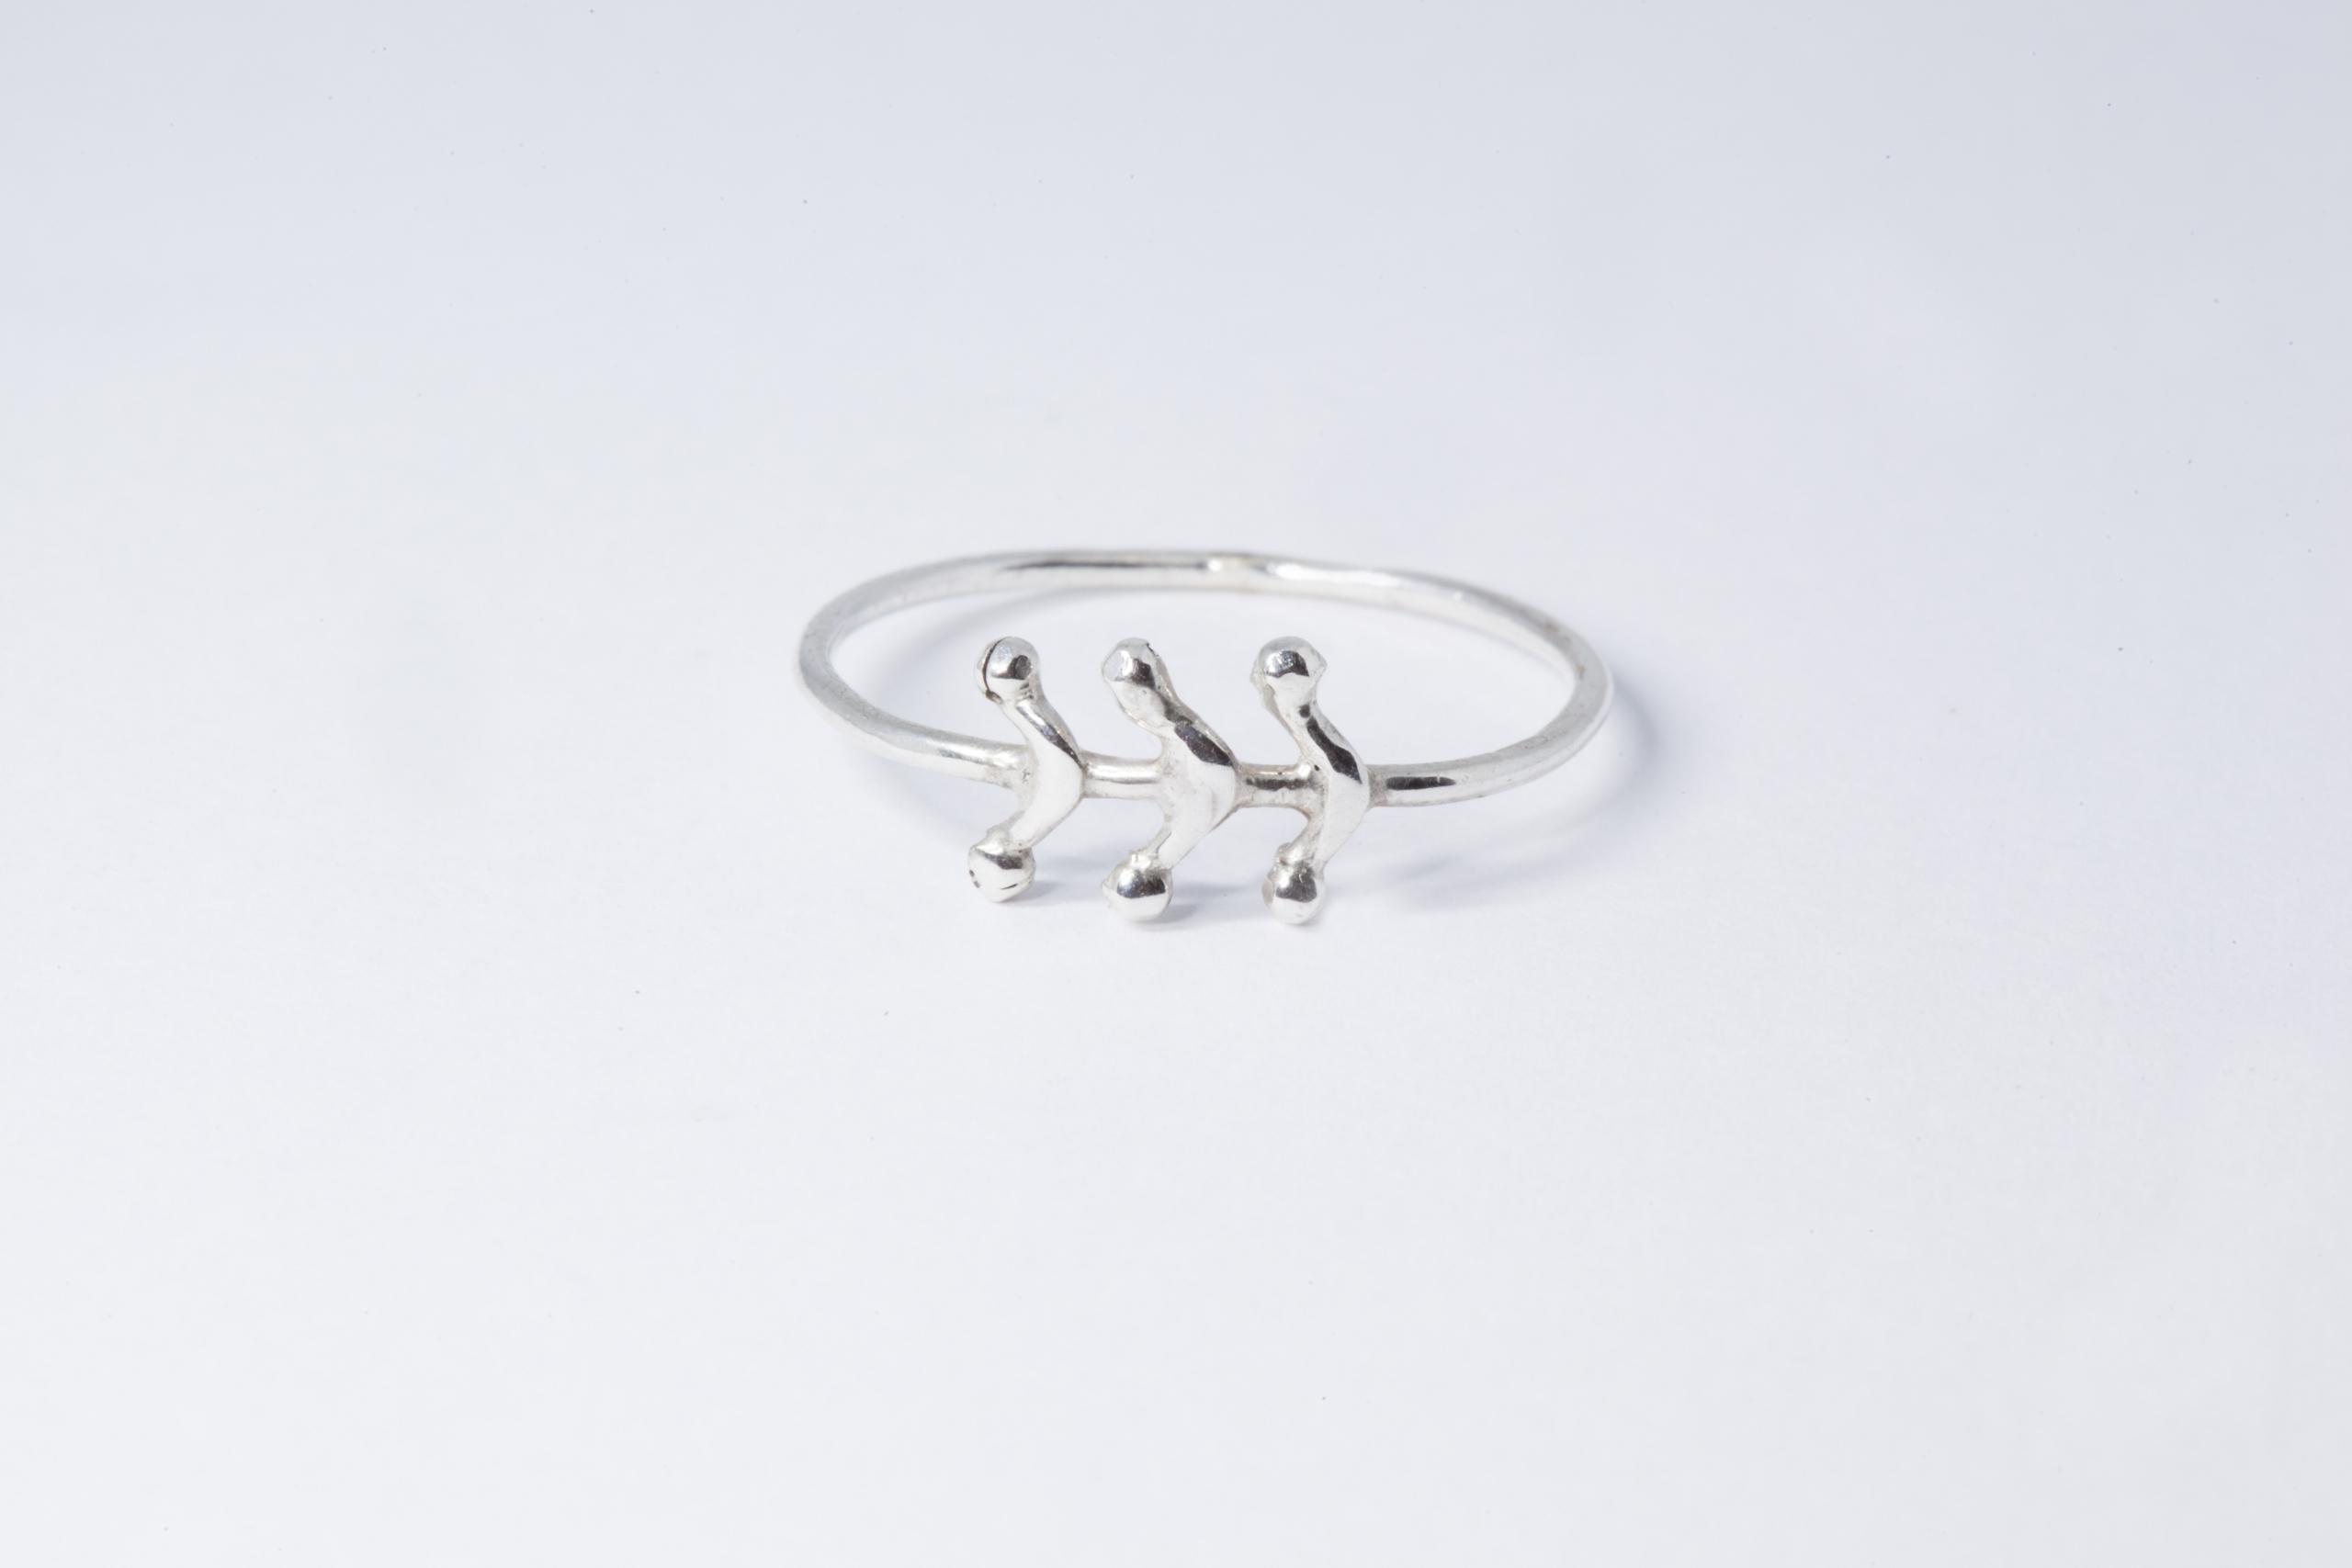 Anillo de hilo 1.2mm de grosor, con detalle de seis ramitas del mismo grosor